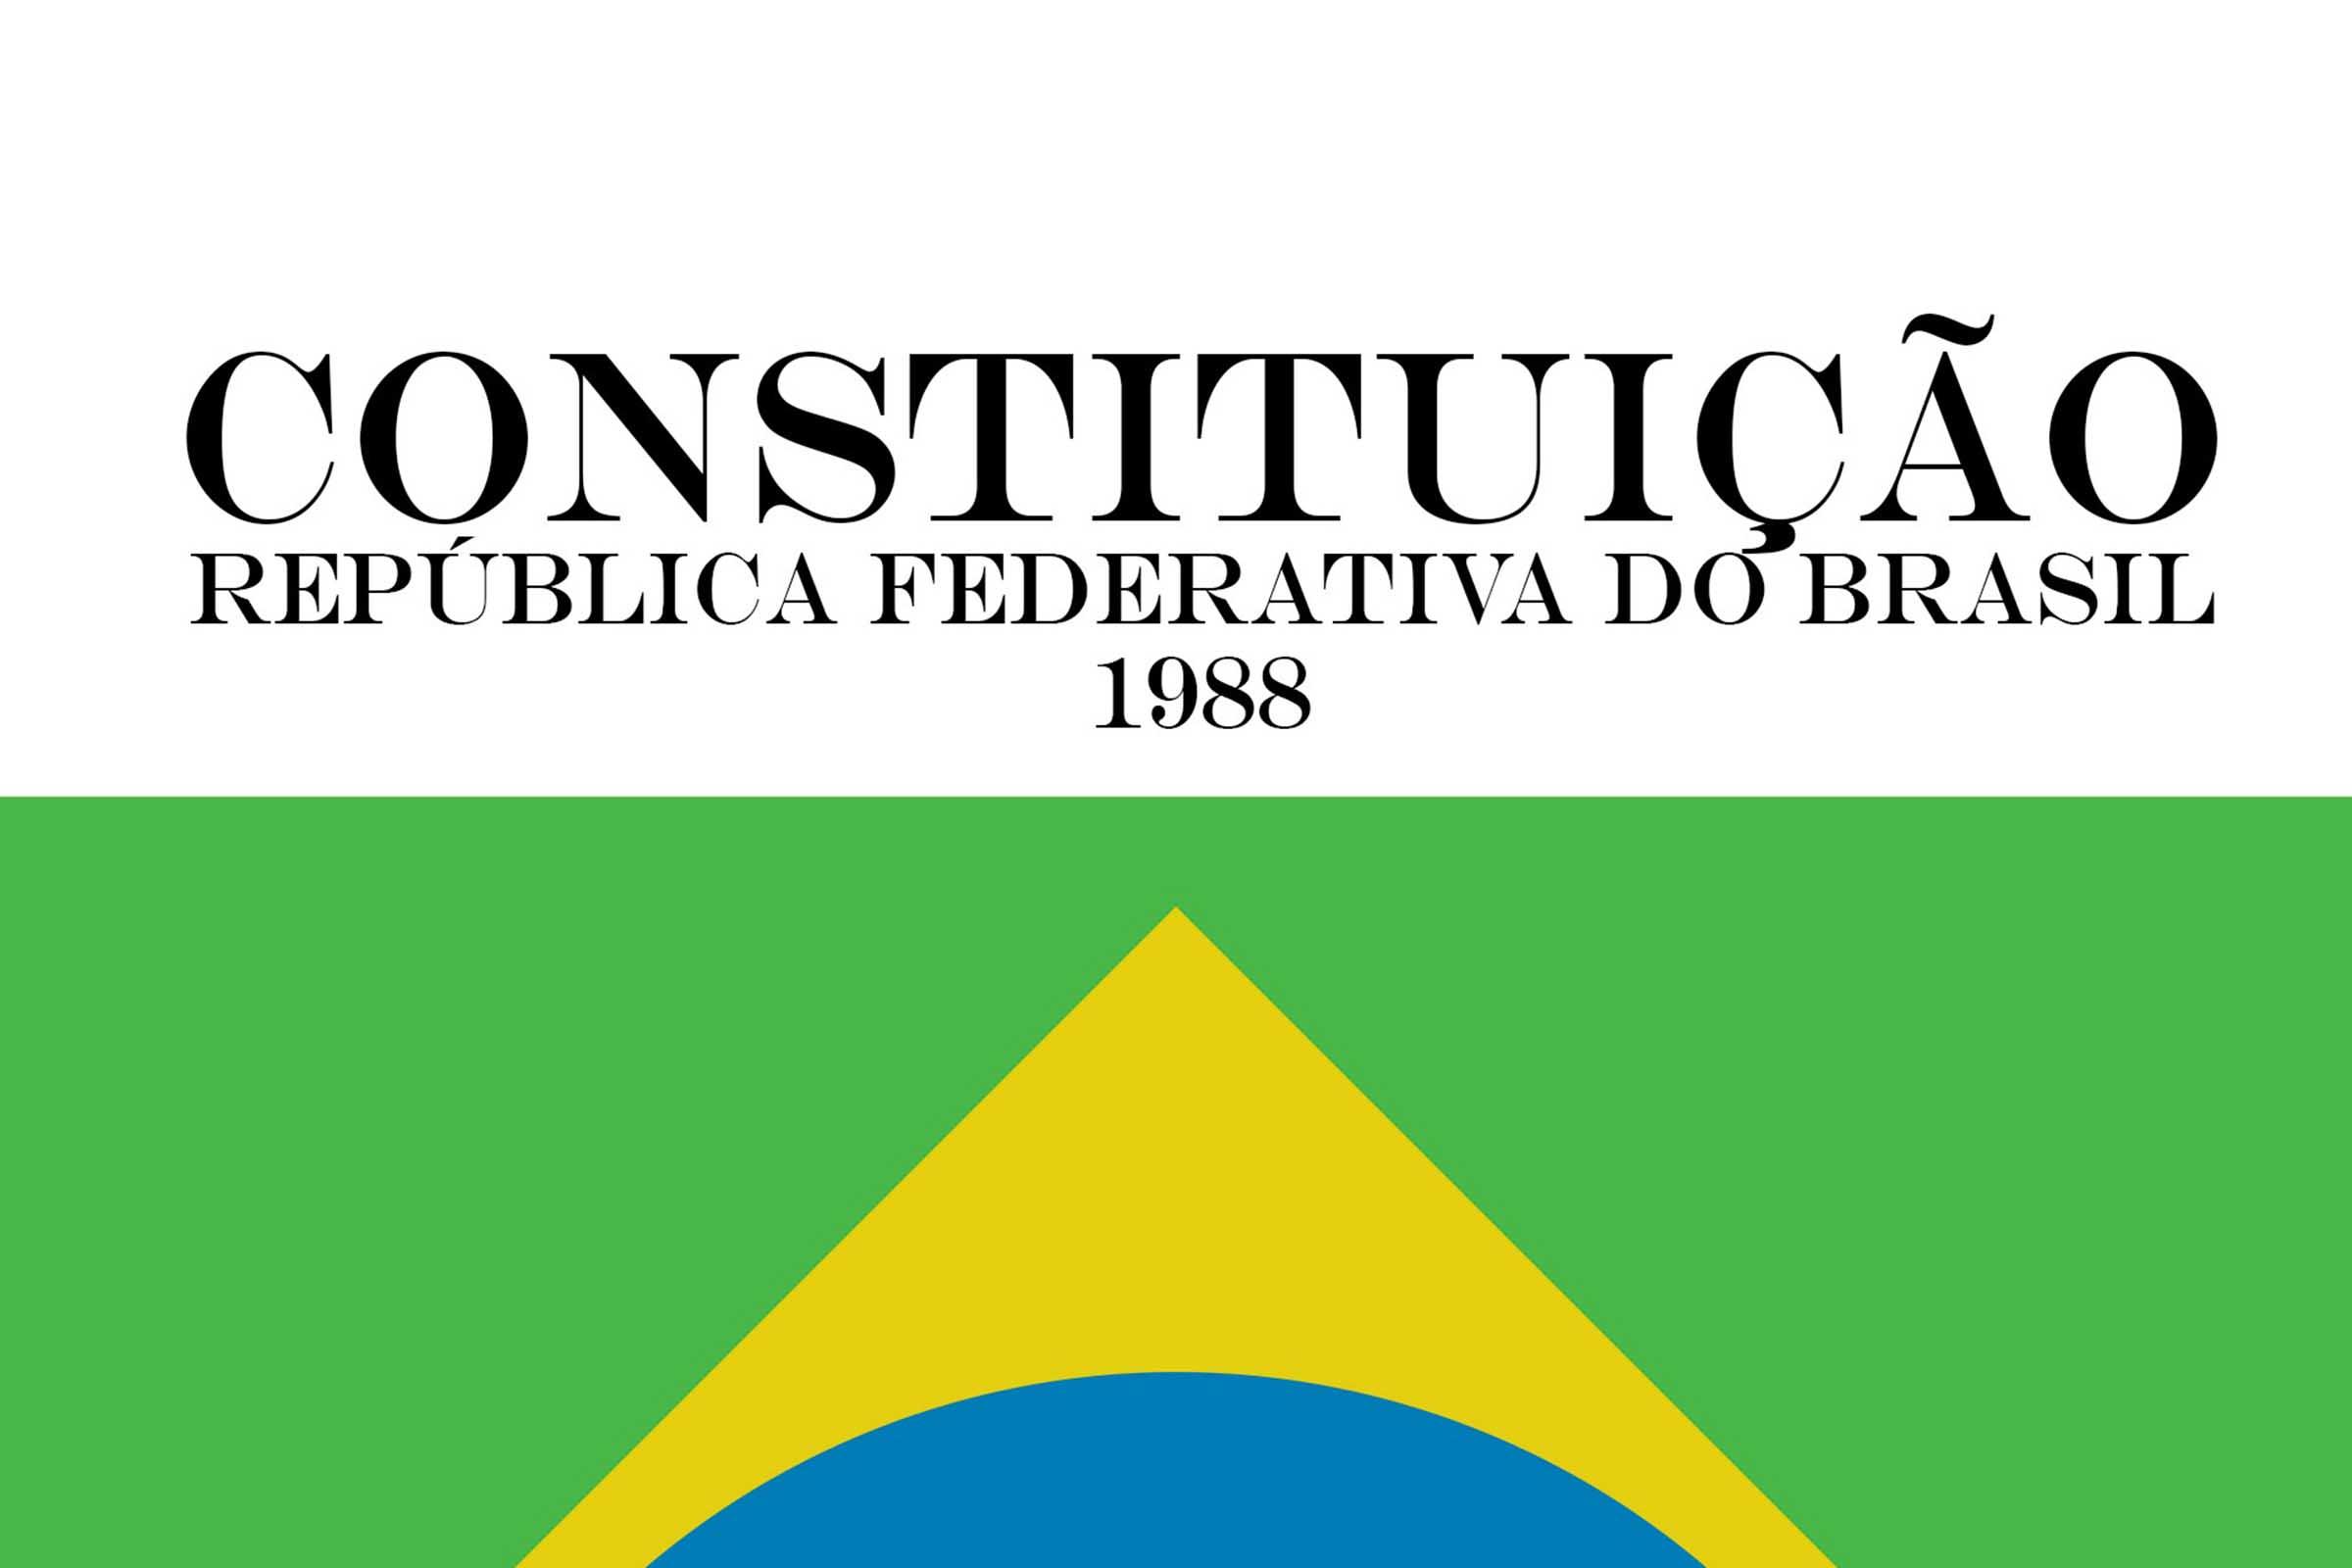 Imagem ilustrativa (fonte: Direito Diário)<a style='float:right' href='https://www3.al.sp.gov.br/repositorio/noticia/N-04-2018/fg221031.jpeg' target=_blank><img src='/_img/material-file-download-white.png' width='14px' alt='Clique para baixar a imagem'></a>